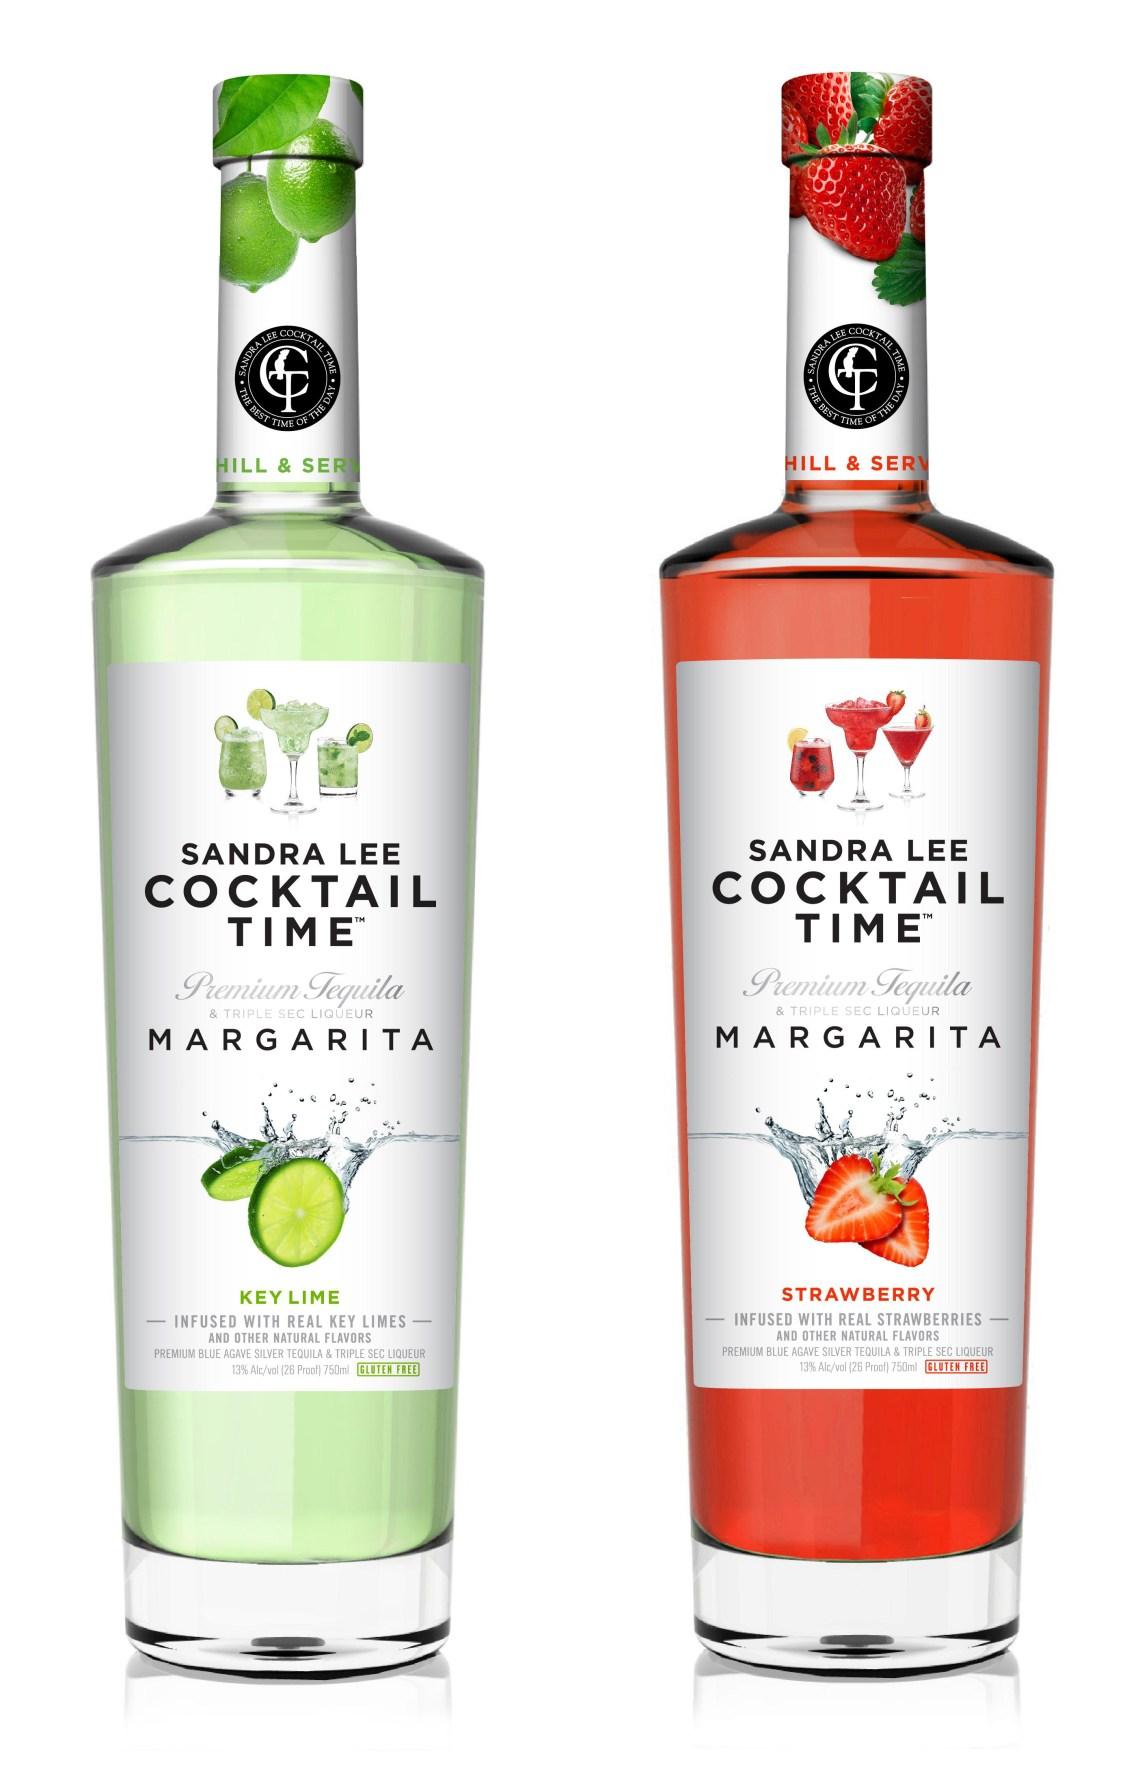 Sandra Lee Cocktail Time Margarita Key Lime